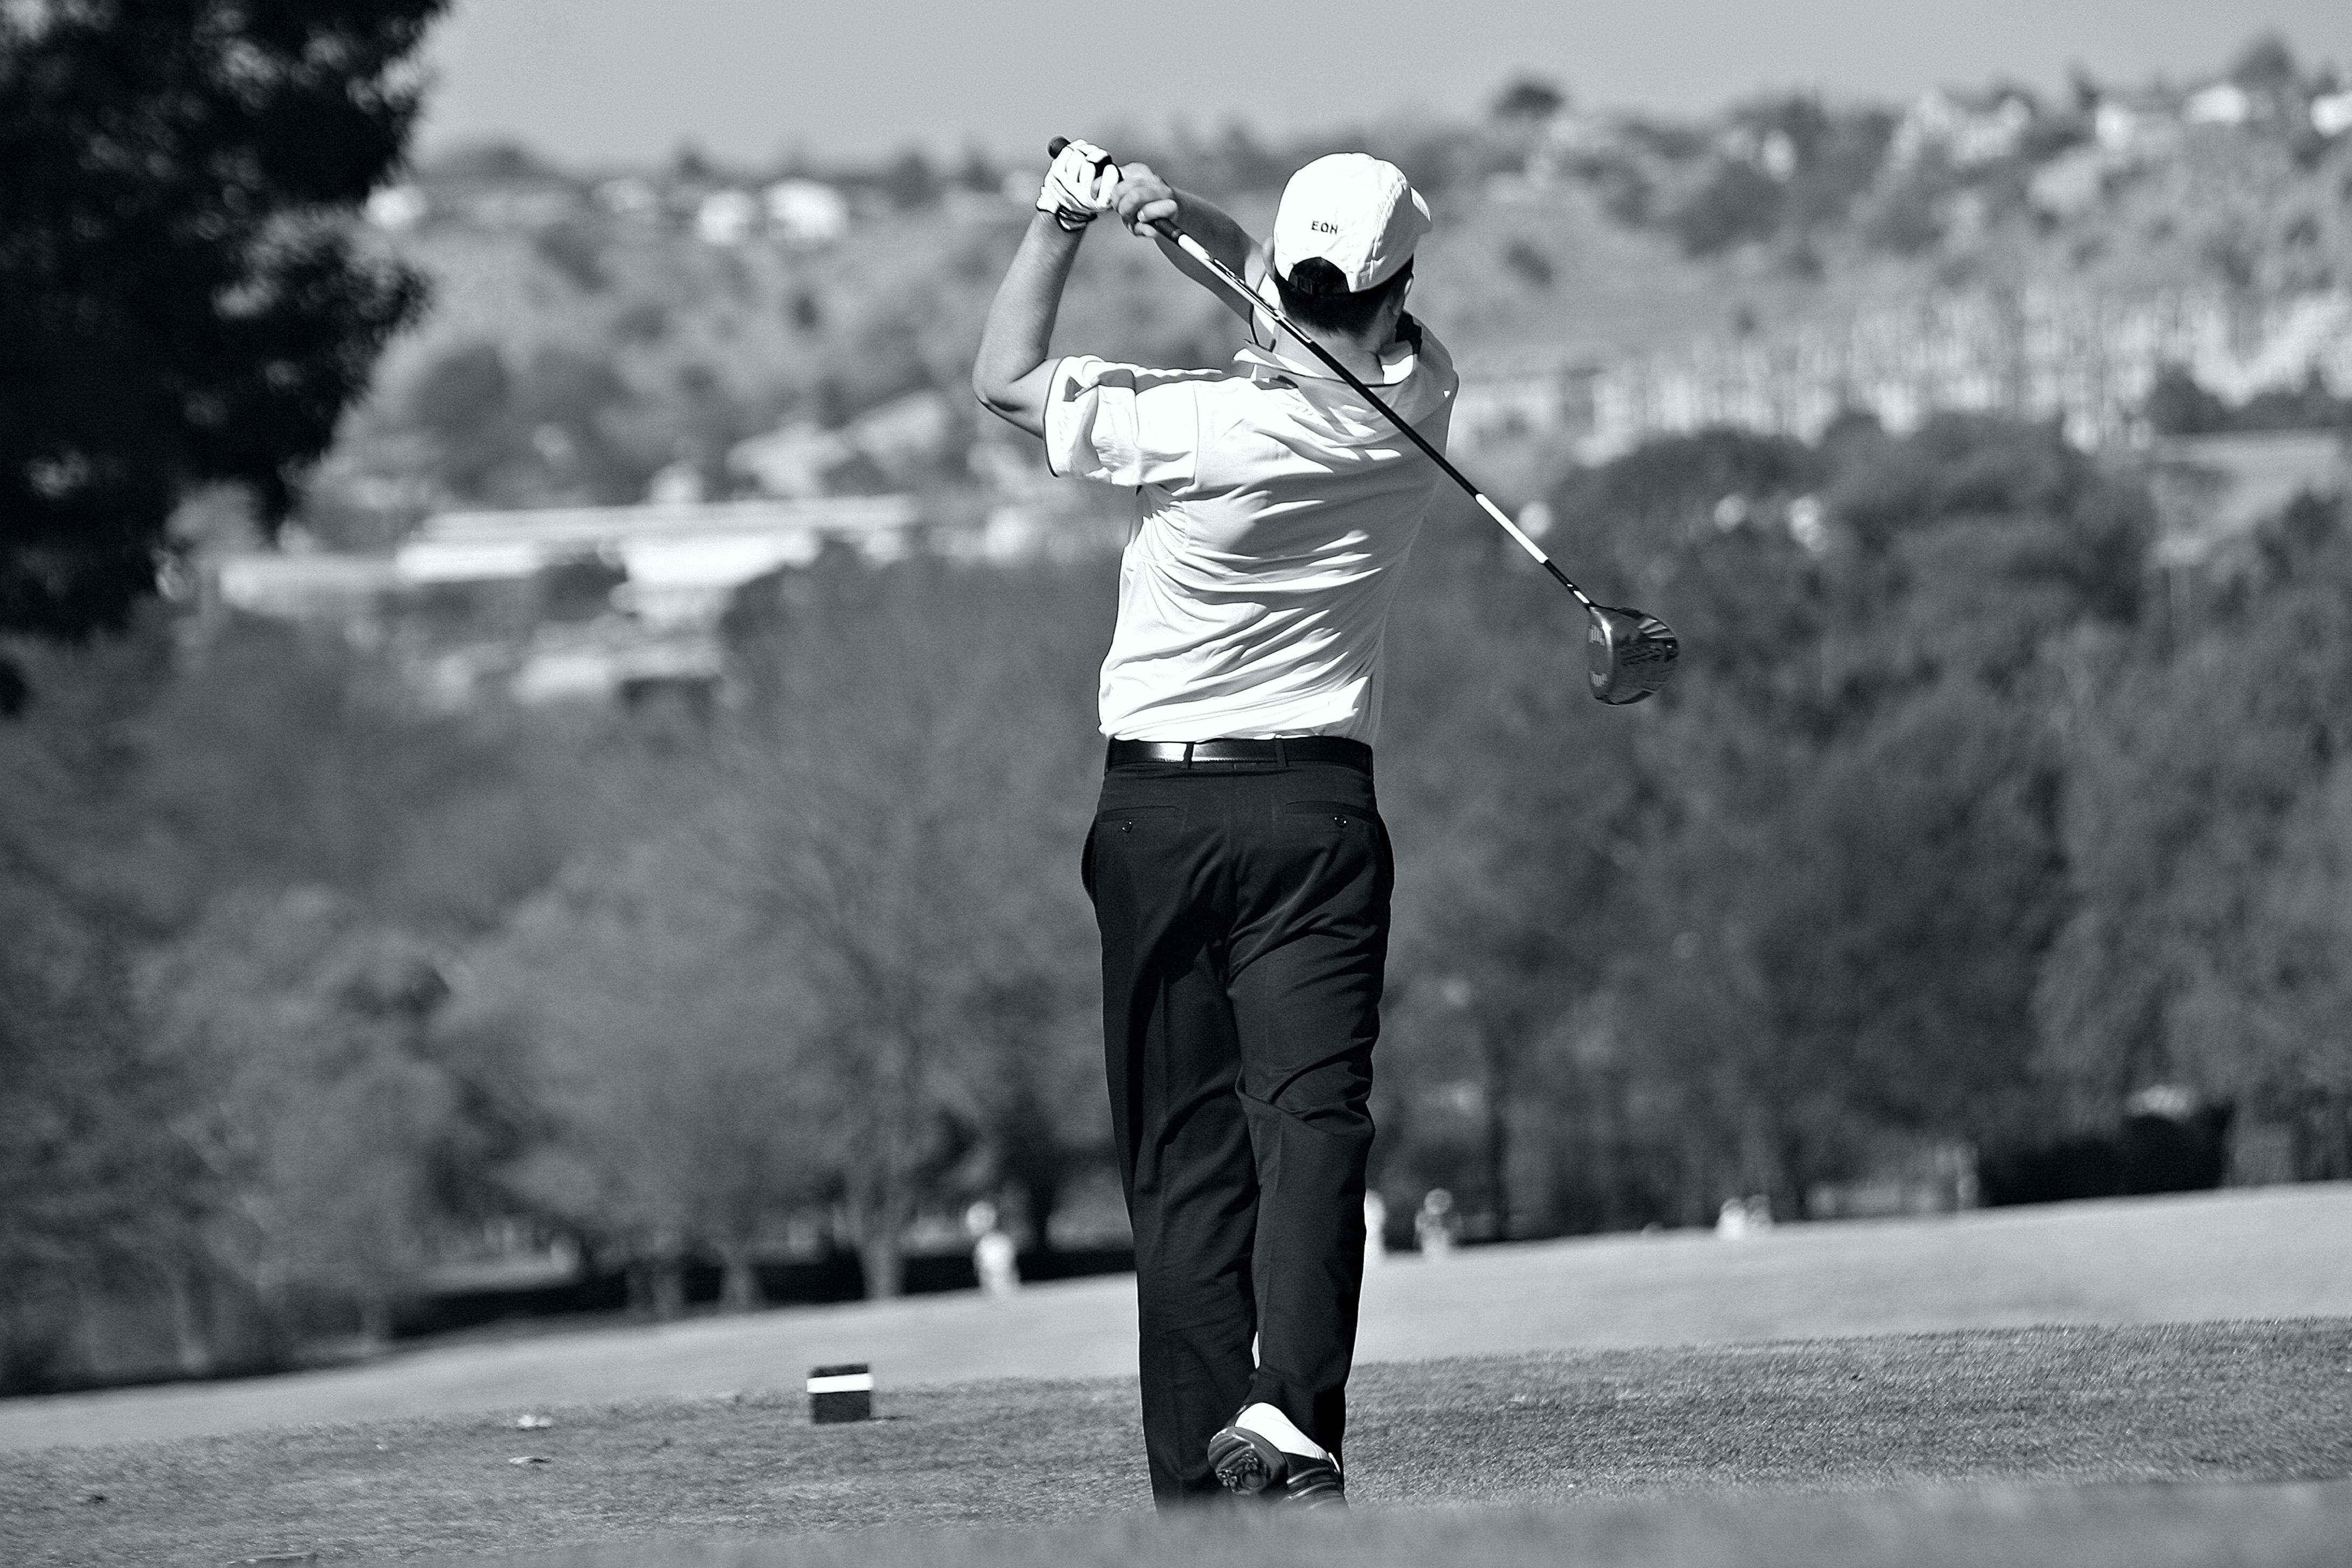 Man Playing Golf Free Stock Photo